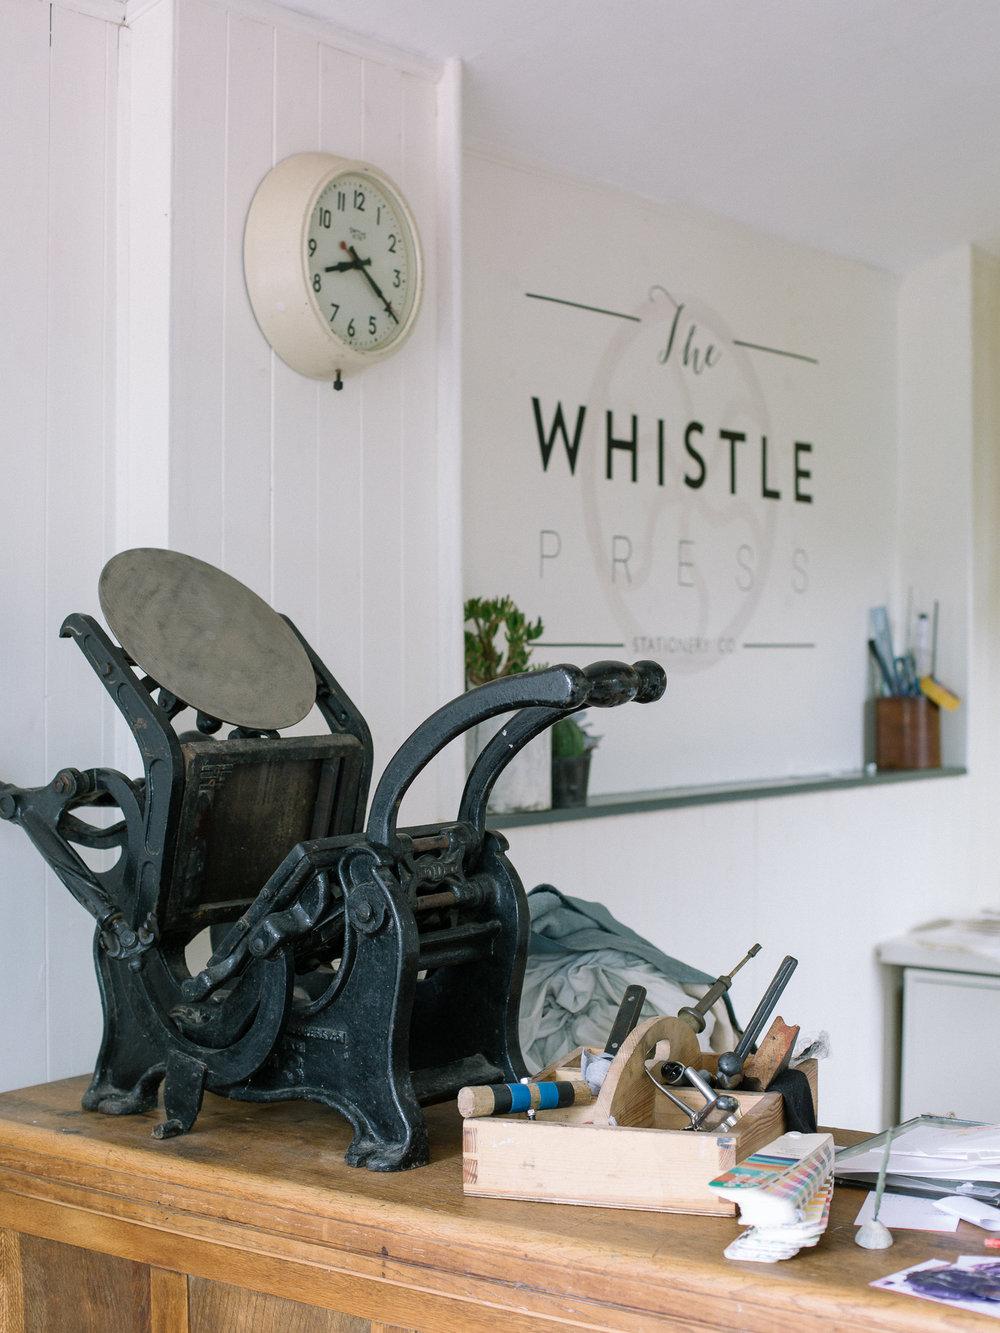 The Whistle Press